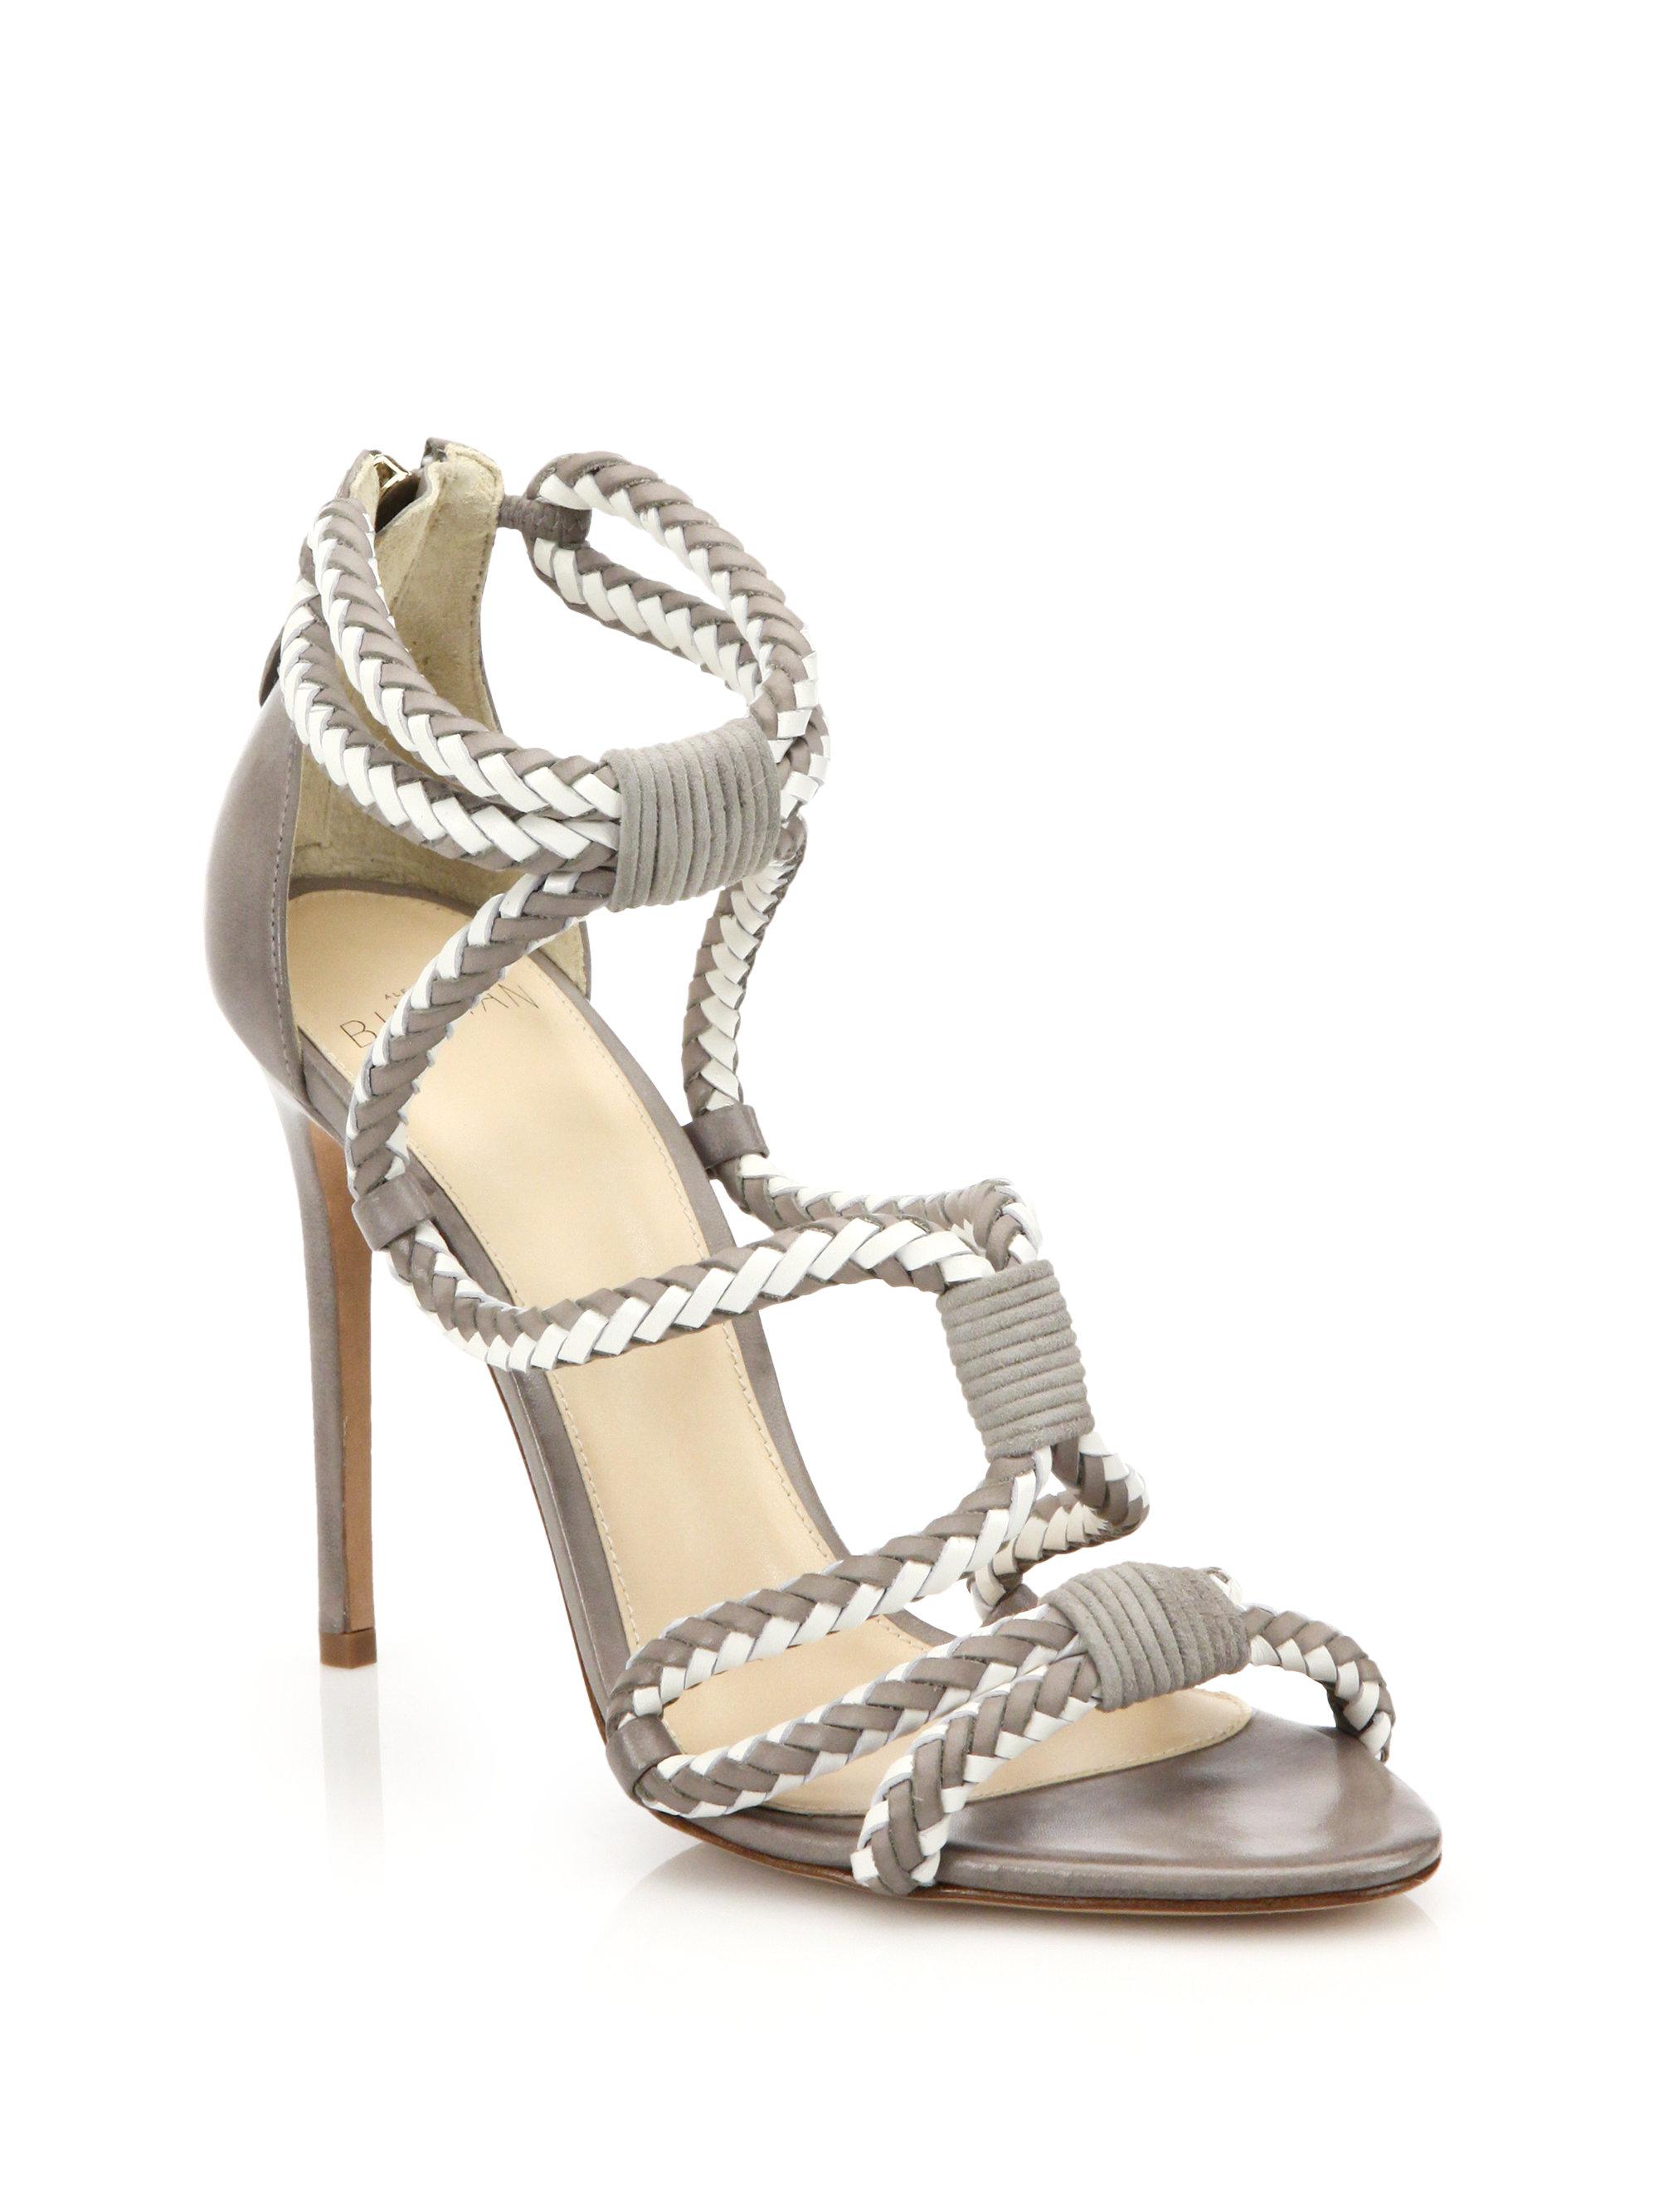 Lyst Alexandre Birman Braided Suede Sandals In Gray